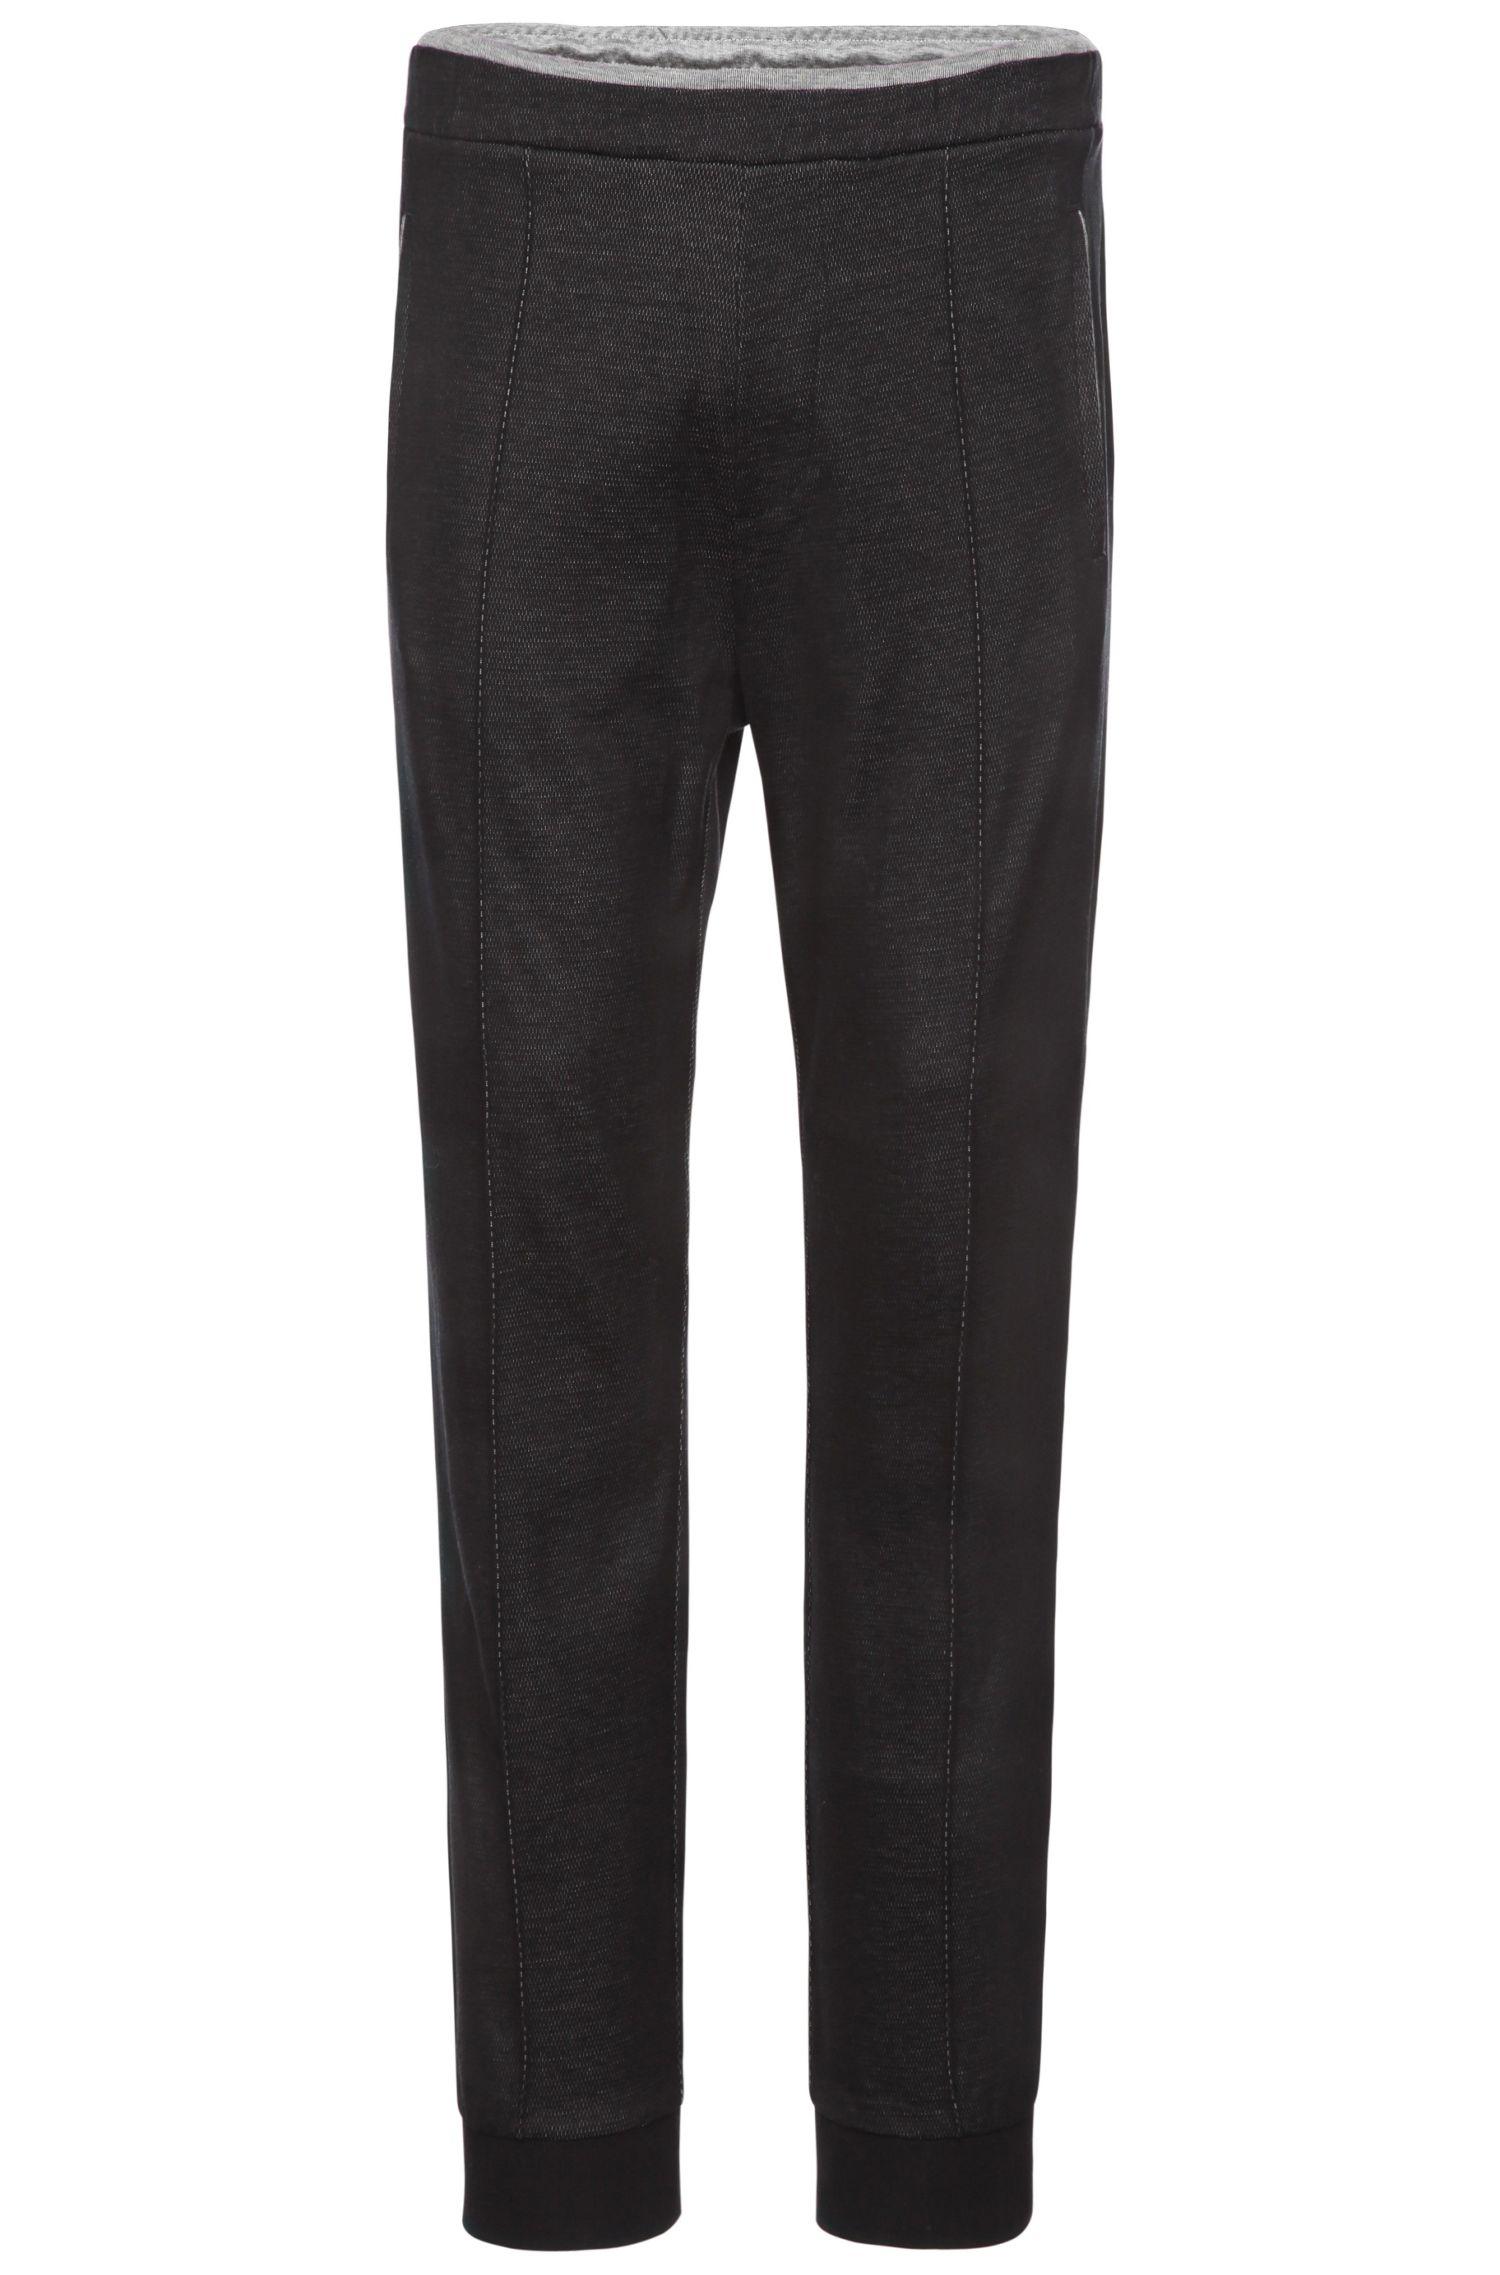 Pantalon de jogging en coton texturé: «Hajus»